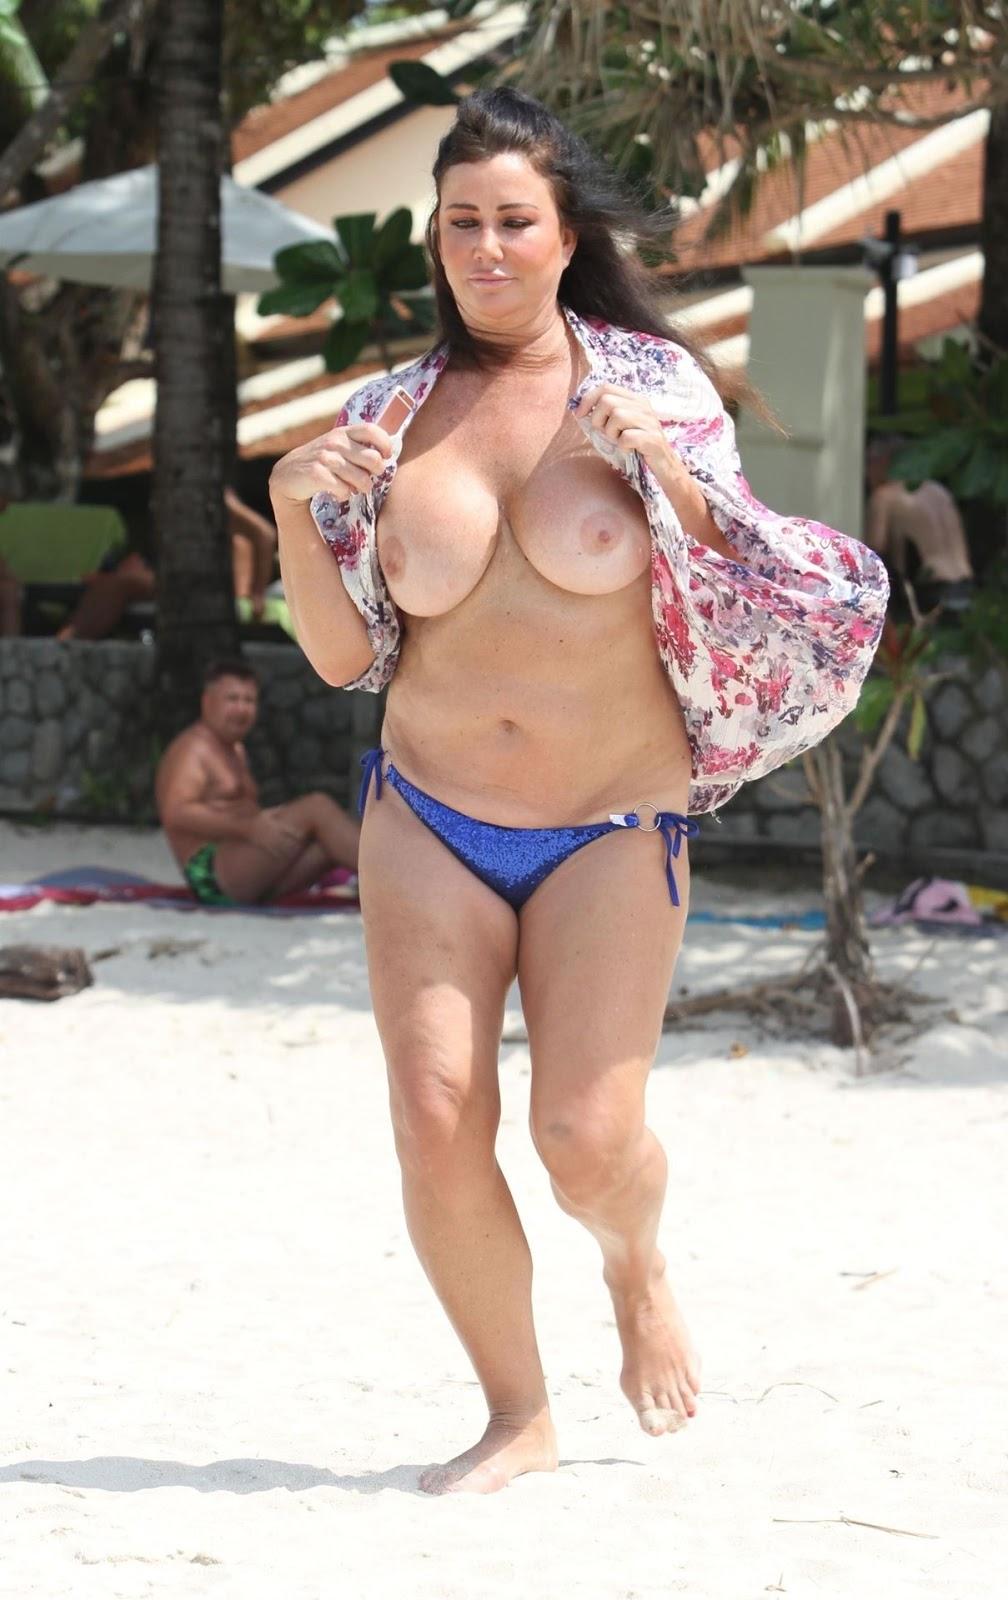 Lisa-Appleton-Topless-On-A-Beach-In-The-Gulf-of-Thailand-m6u7w95u7f.jpg